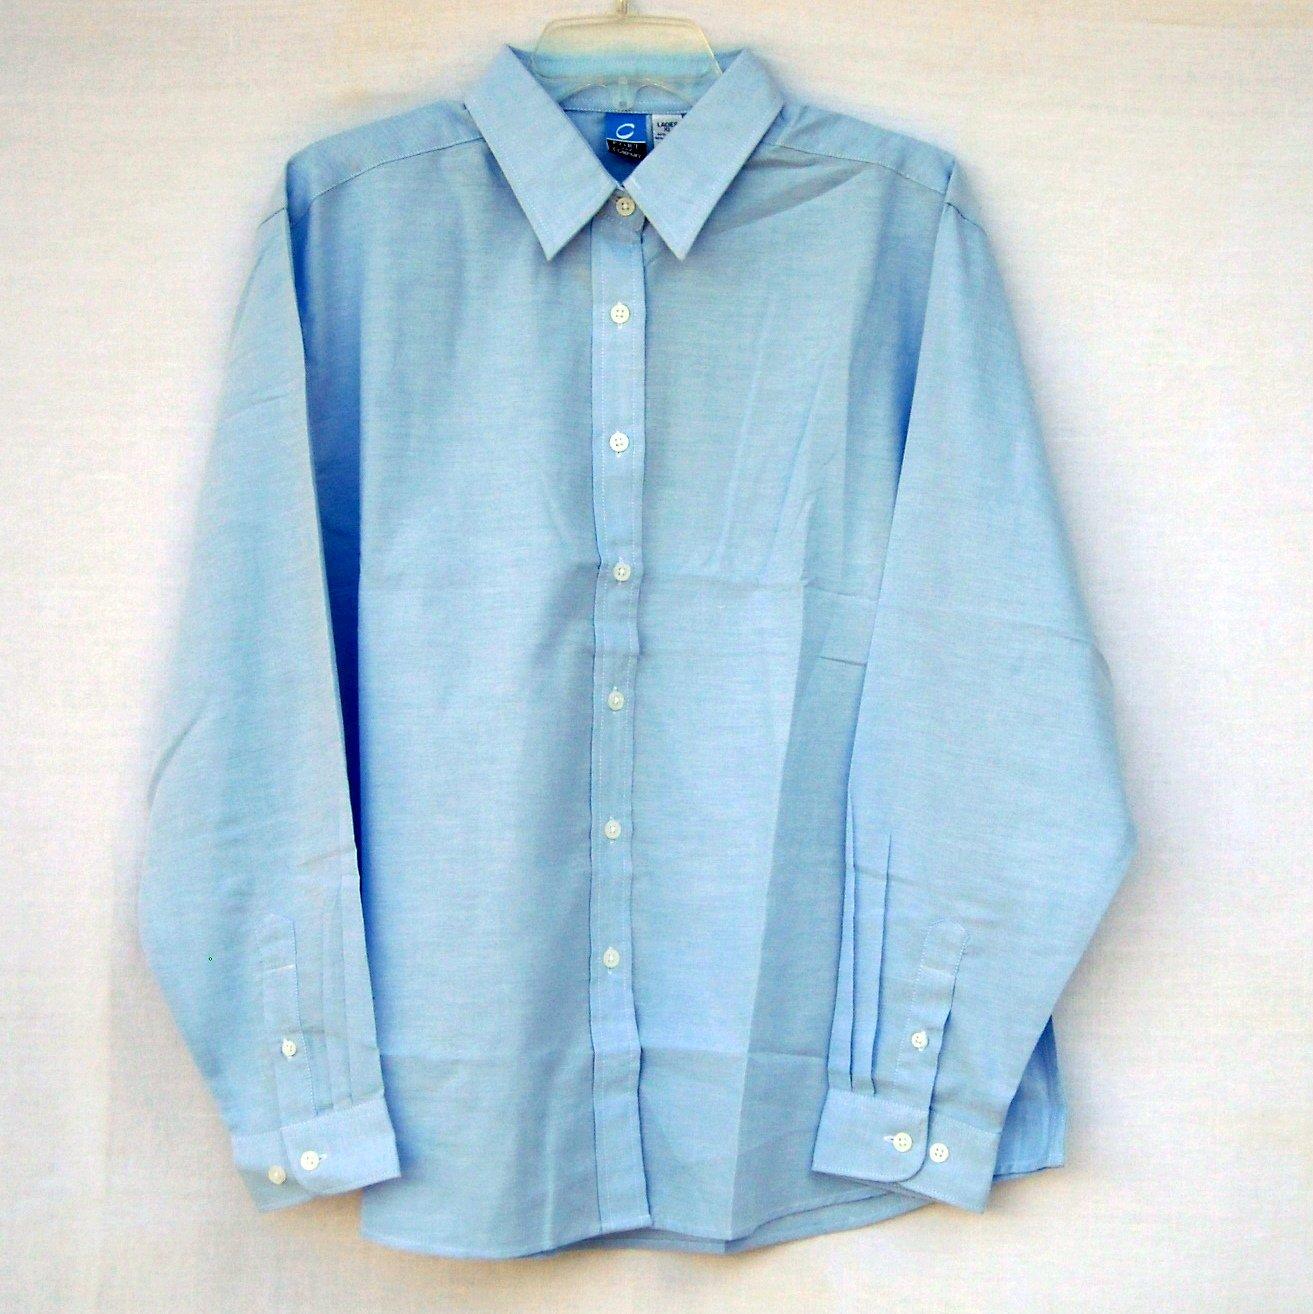 Misses Blue Denim Button Up Western Shirt Top Size XL